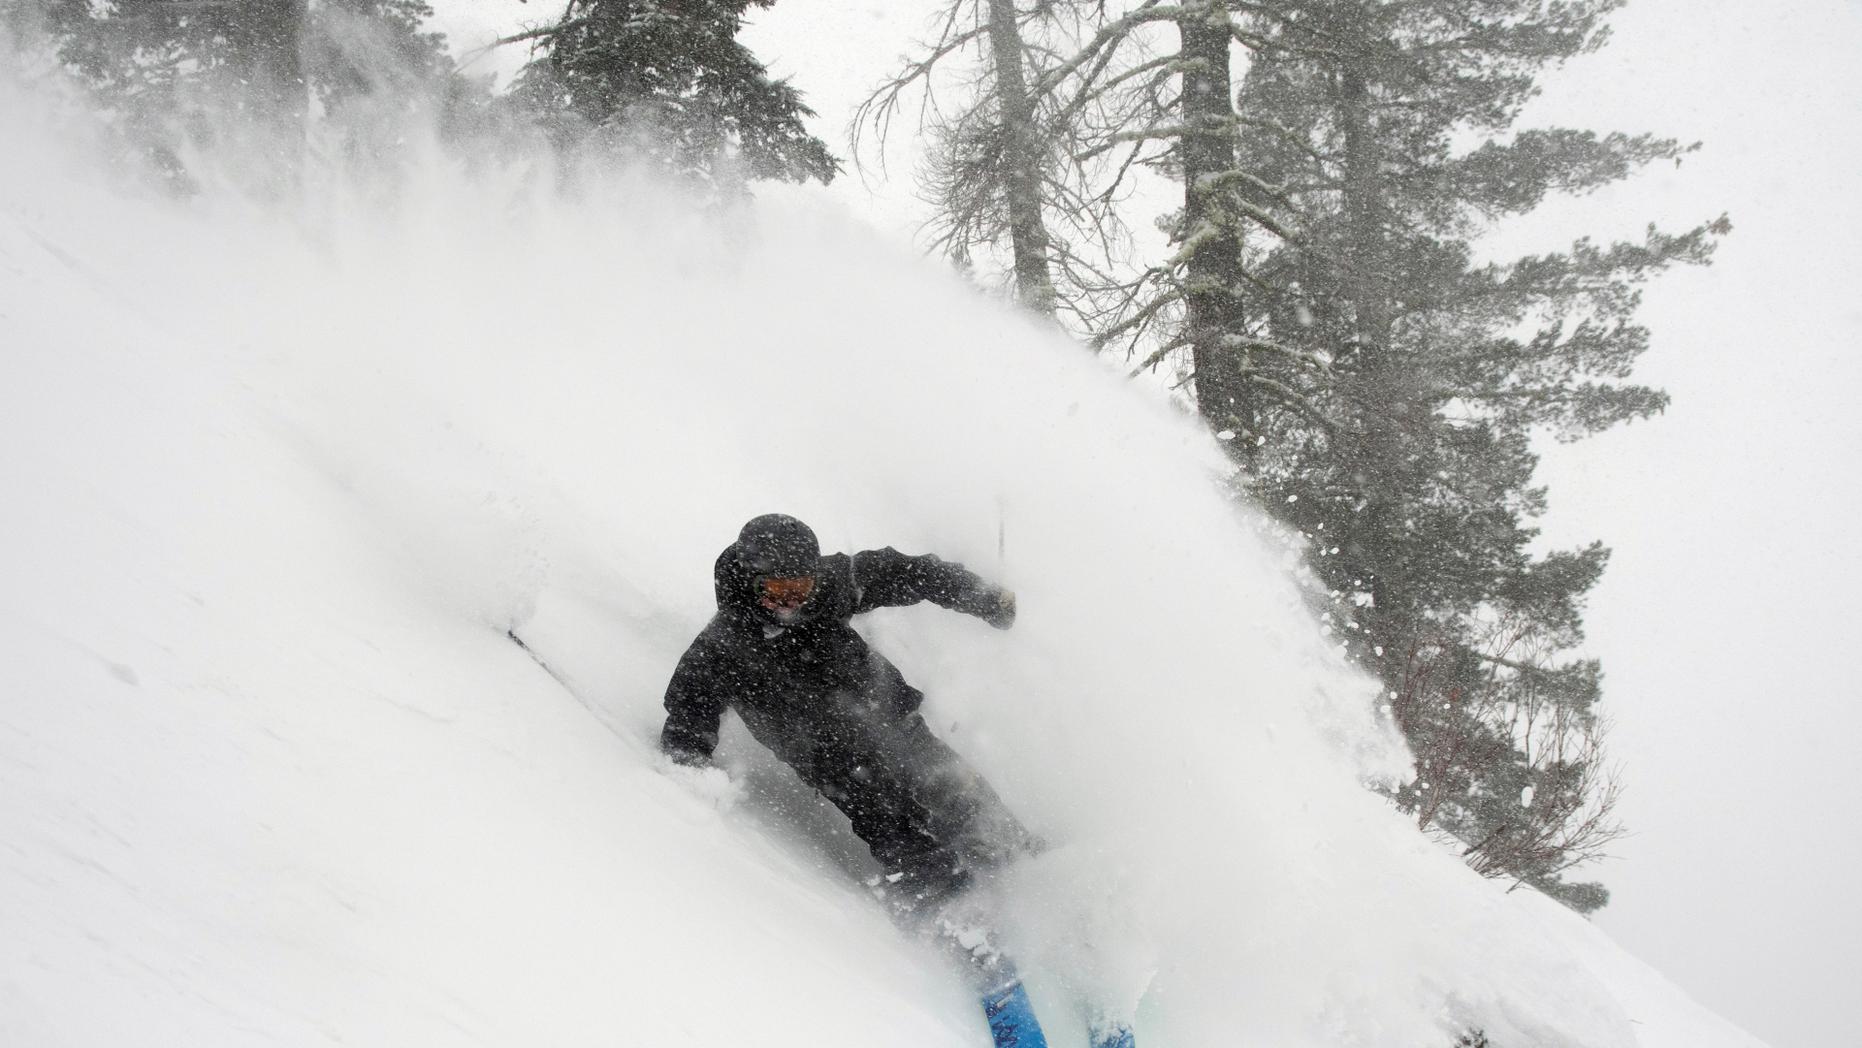 In this photo provided by Blake Kessler, Wesley Kepke skis in Alpine Meadows, Calif., on Sunday, Jan. 6, 2019. A winter storm swept through parts of California, Nevada and Utah, bringing heavy snow to some communities. (Blake Kessler via AP)